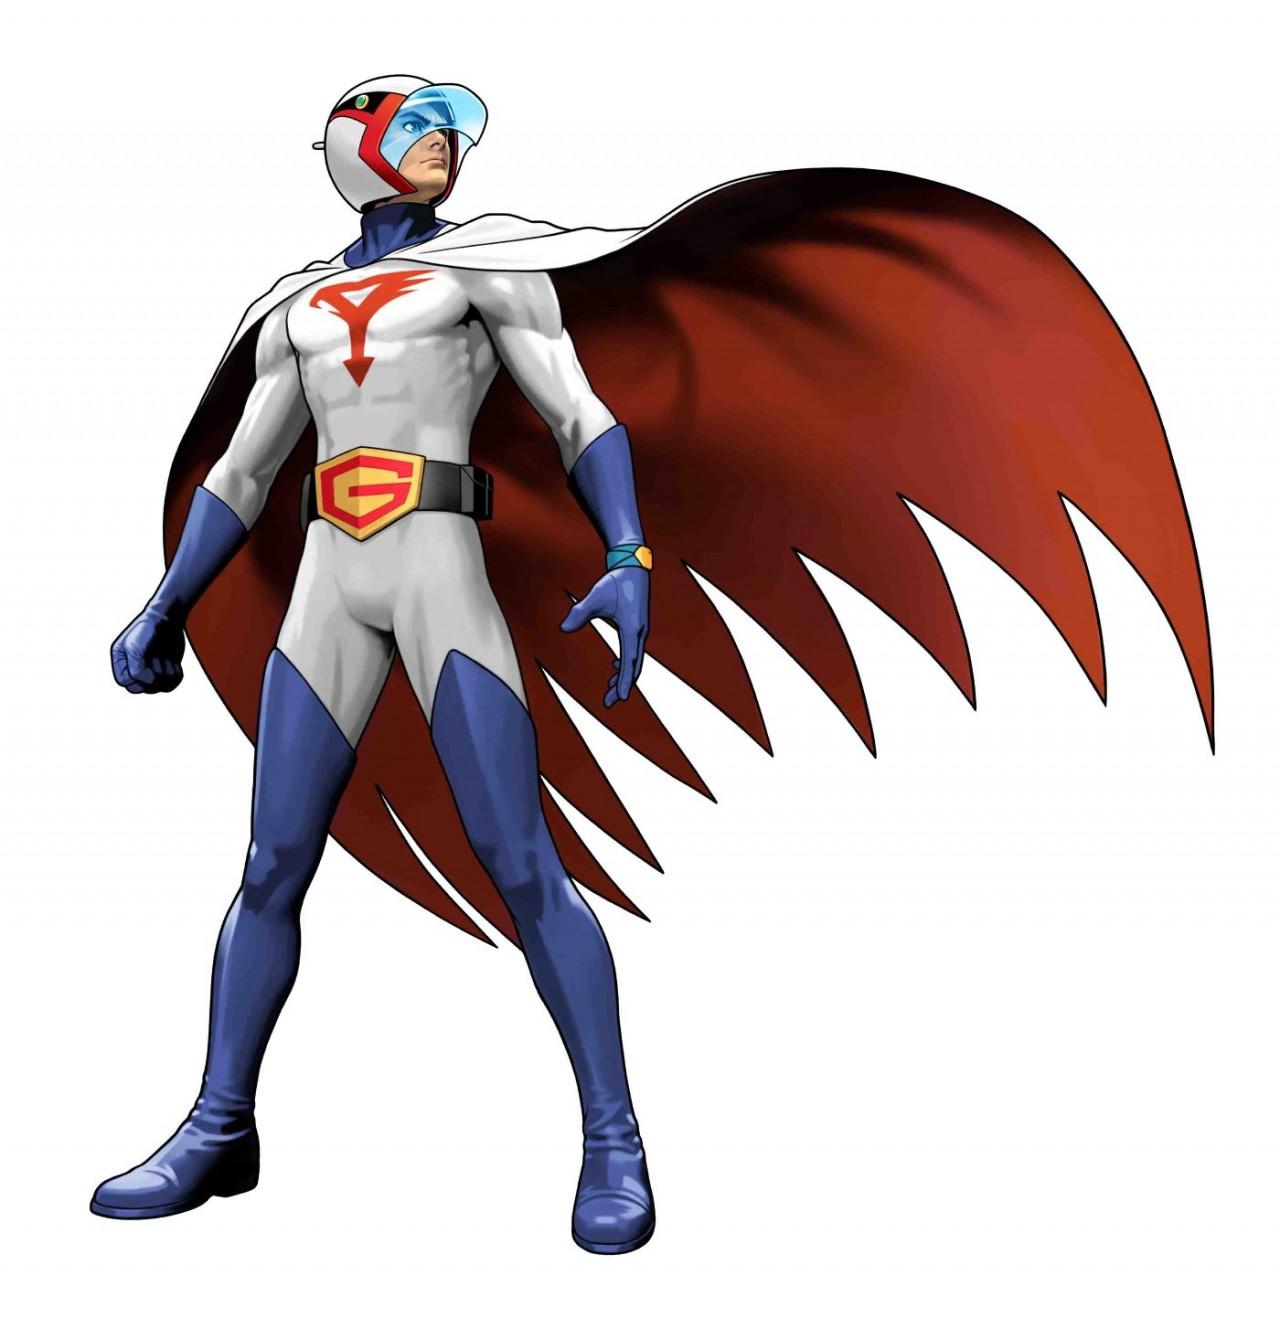 Category:Characters | Gatchaman Wiki | FANDOM powered by Wikia